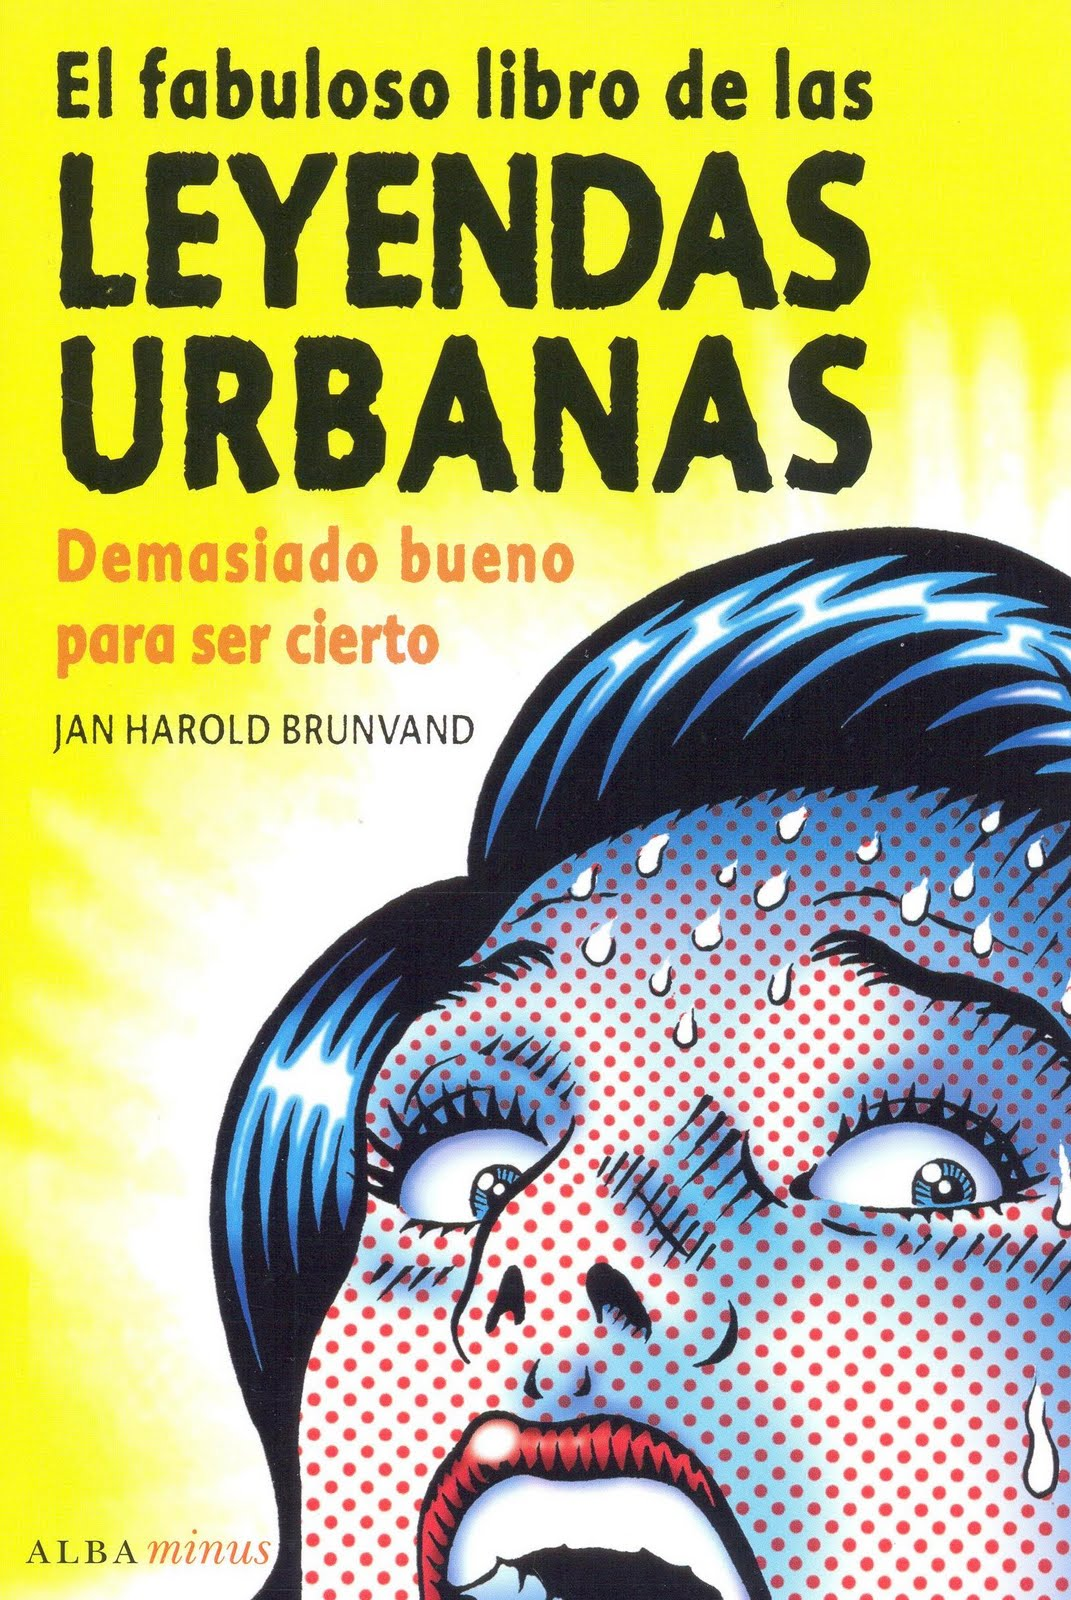 http://1.bp.blogspot.com/-m7jjZQHhMjs/T1UvmxgFR6I/AAAAAAAAAbU/G4GB3wkctQ4/s1600/El+fabuloso+libro+de+las+leyendas+urbanas.jpg